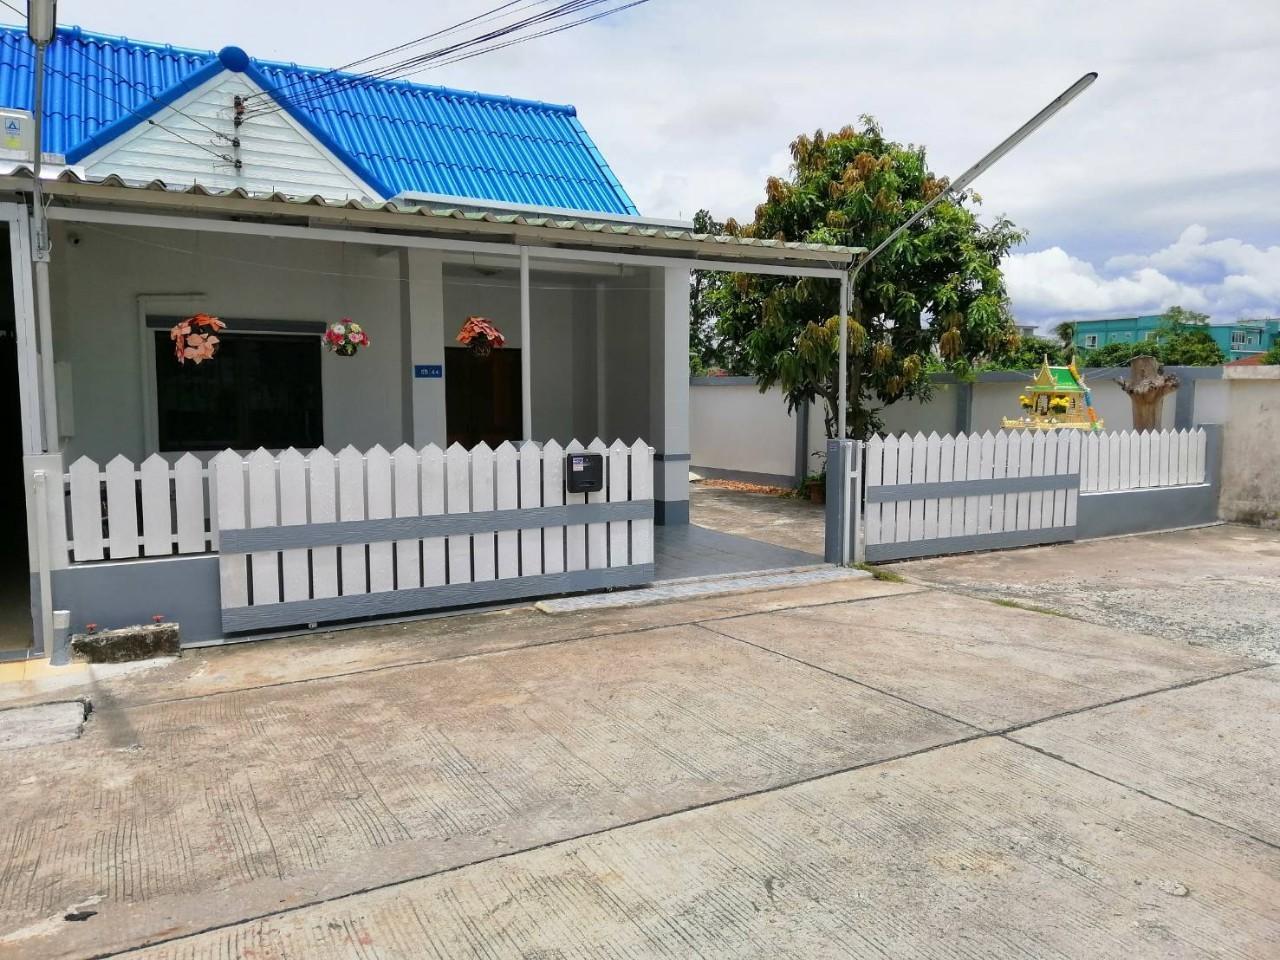 NB Bangsaen house NB Bangsaen house